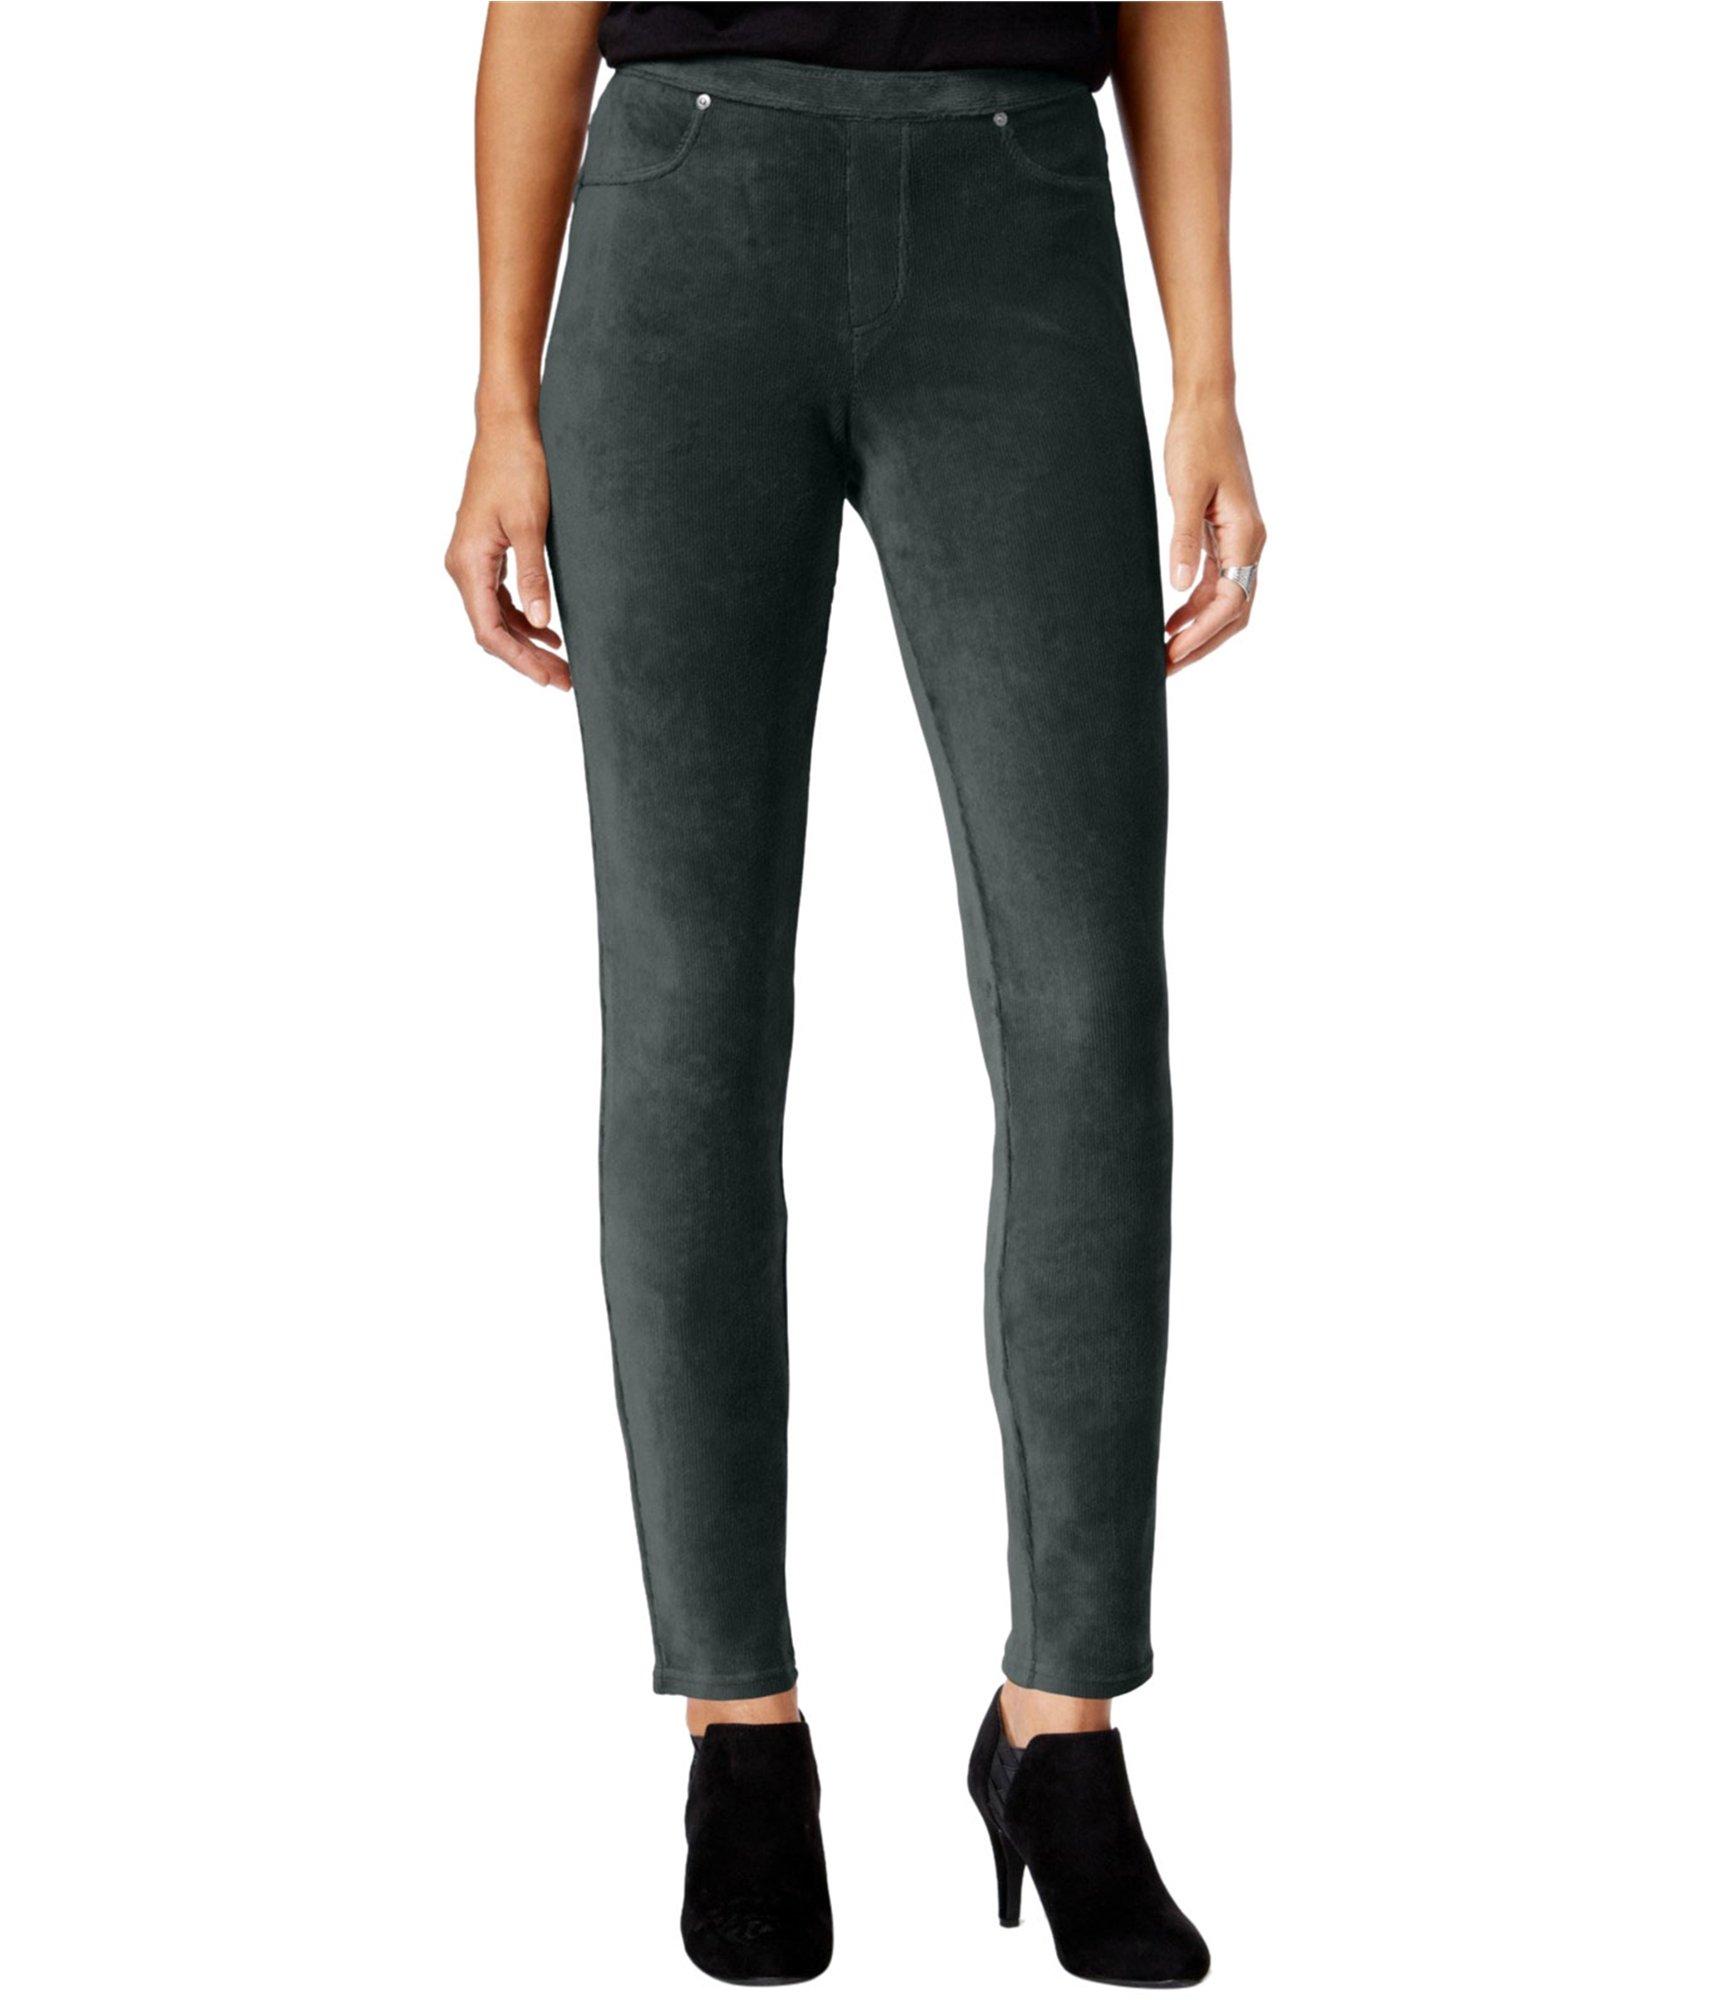 Style & Co. Womens Corduroy Casual Leggings Grey PP/26 - Petite